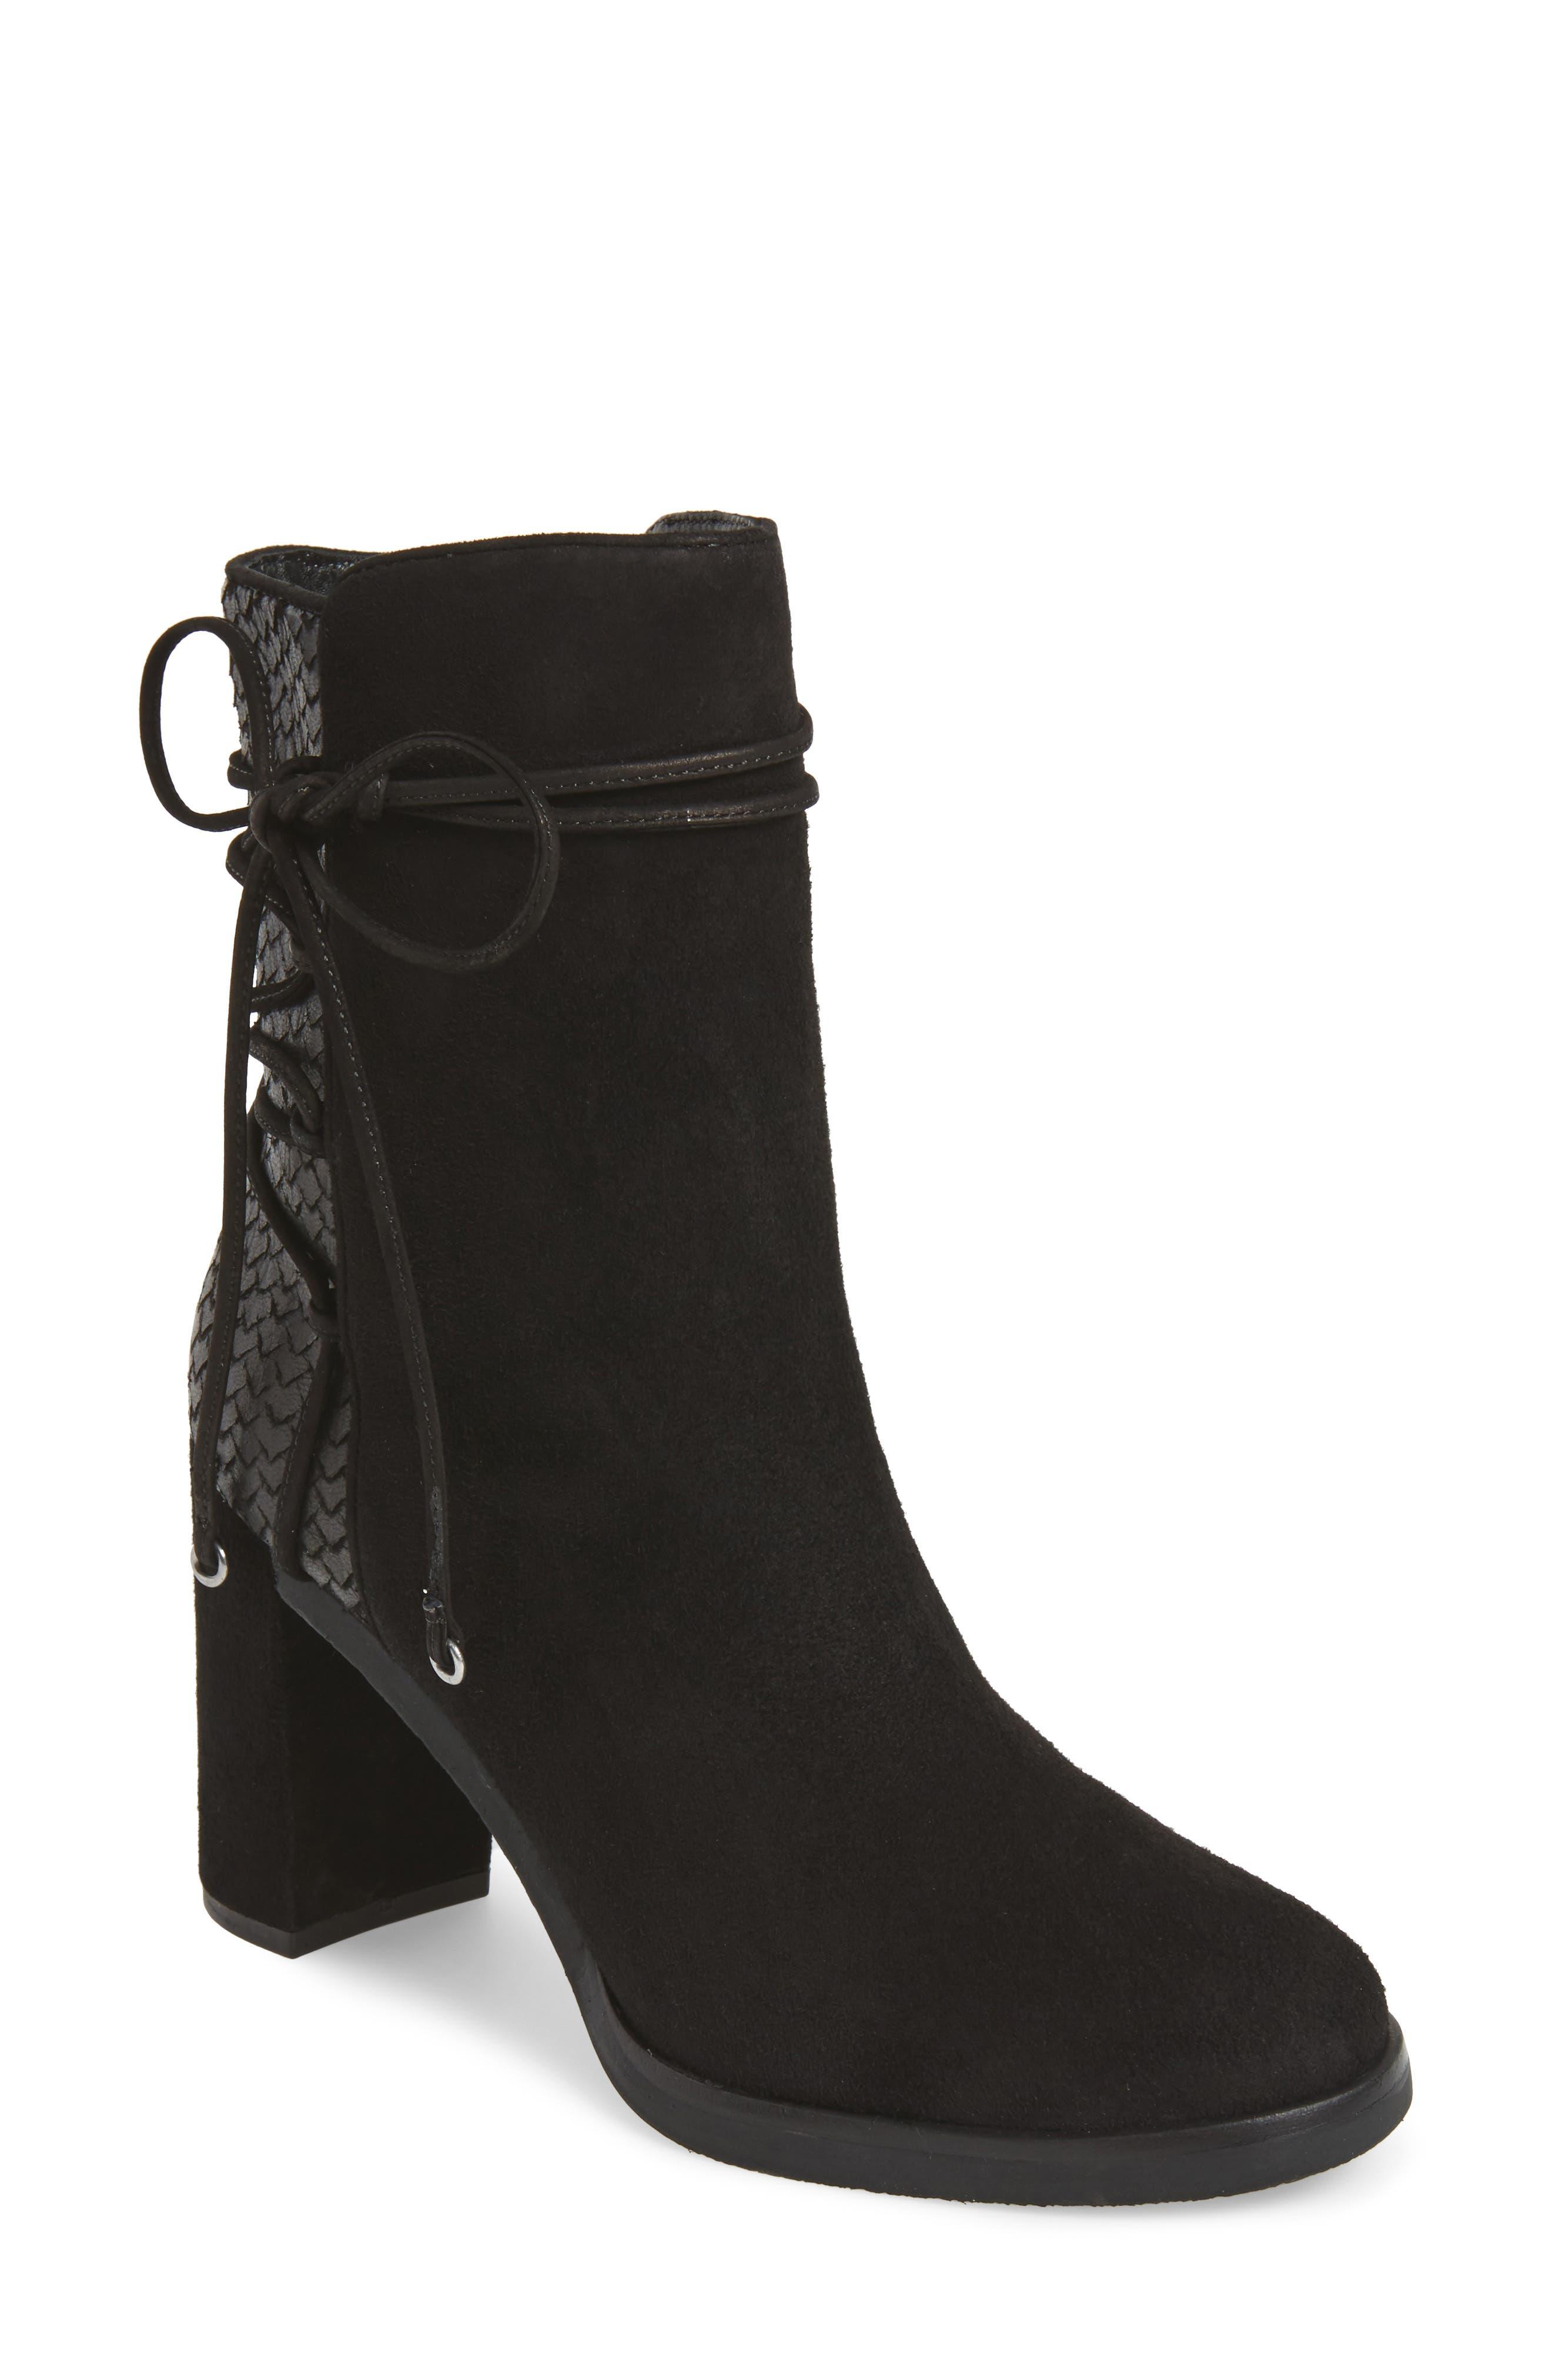 Adley Ankle Wrap Boot,                             Main thumbnail 1, color,                             Black Suede